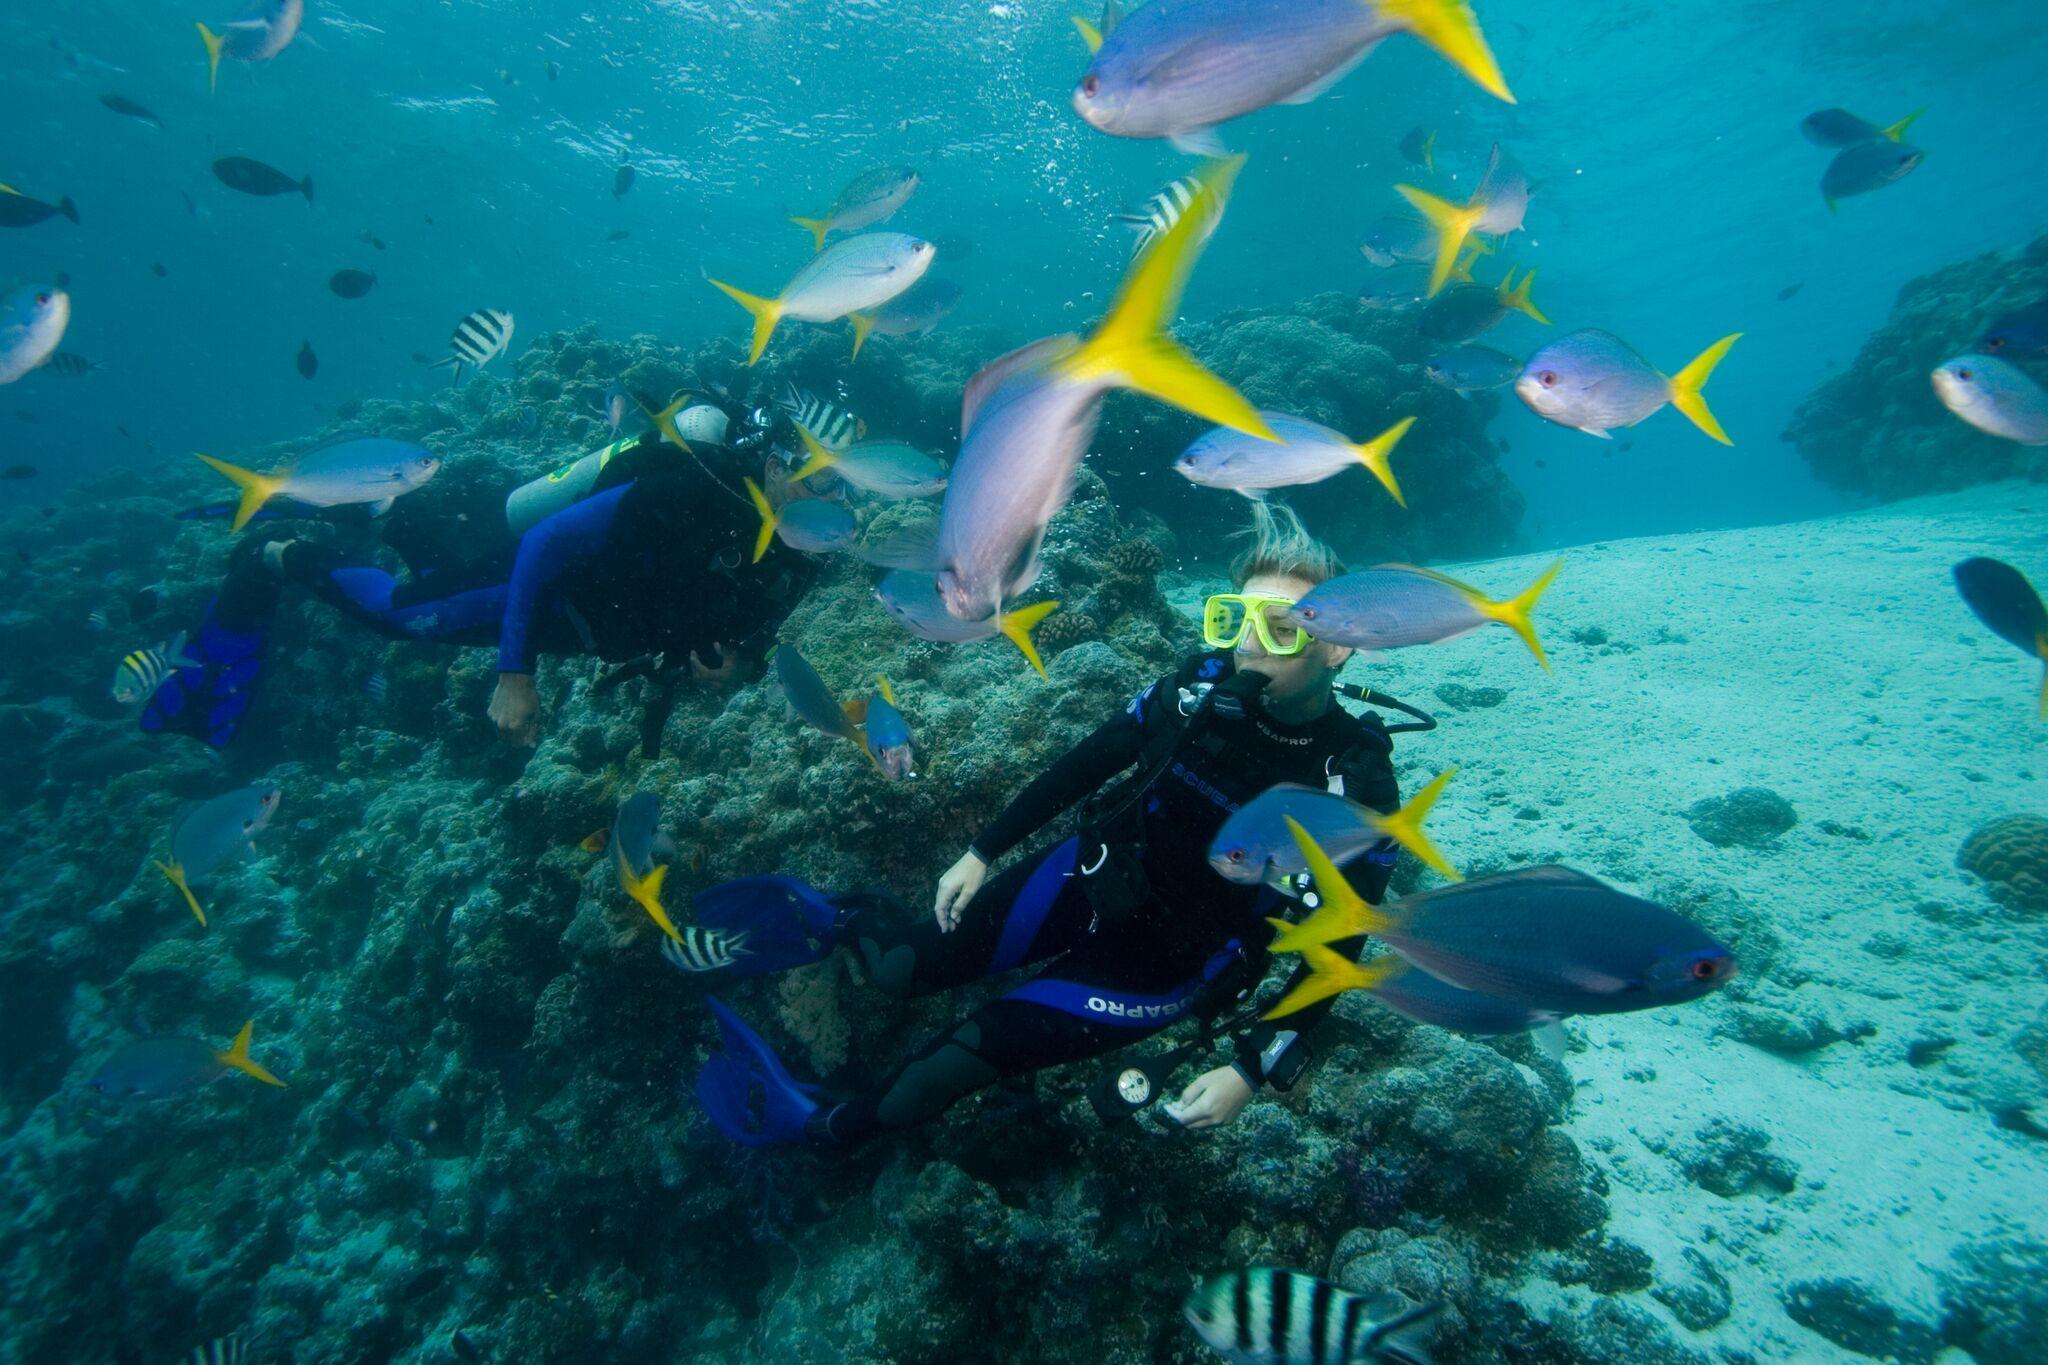 lawica ryb pod woda